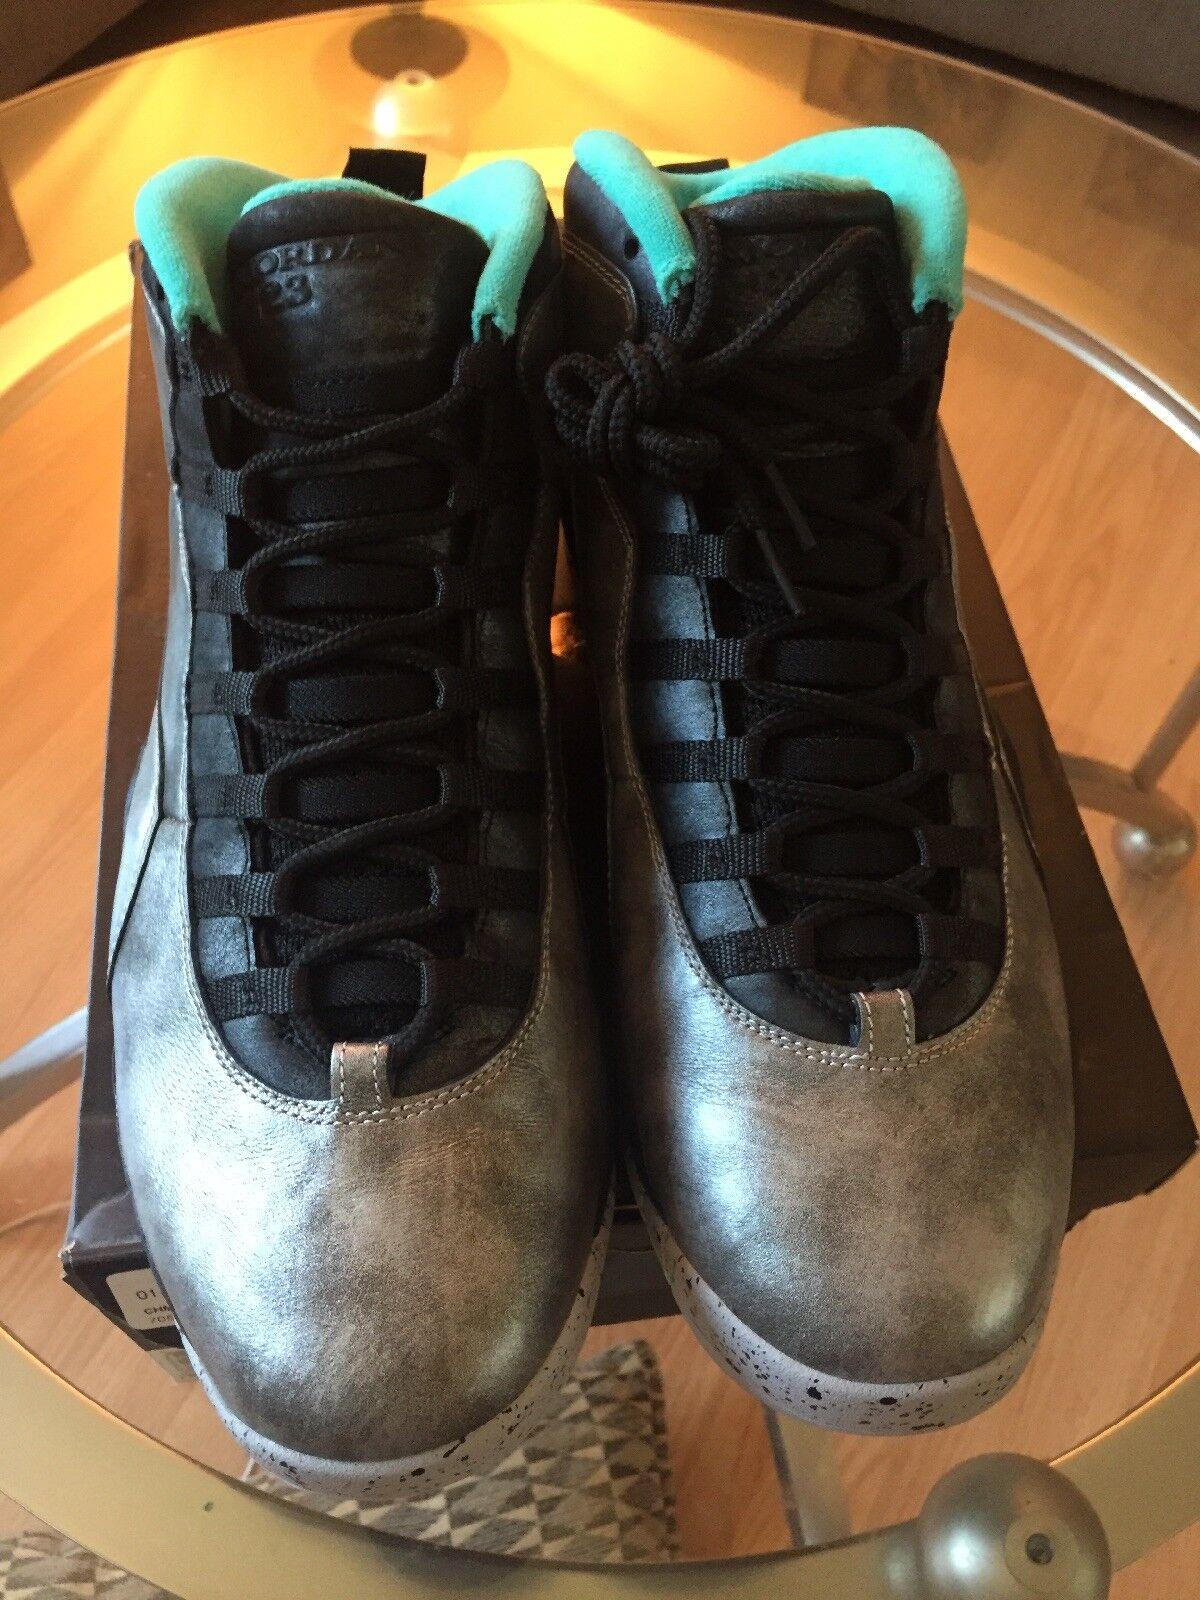 outlet store edf06 37e56 ... Nike Air Air Air Jordan 10 Retro Liberty Size 12 NYC ASG MSG Silver  Gold Star ...